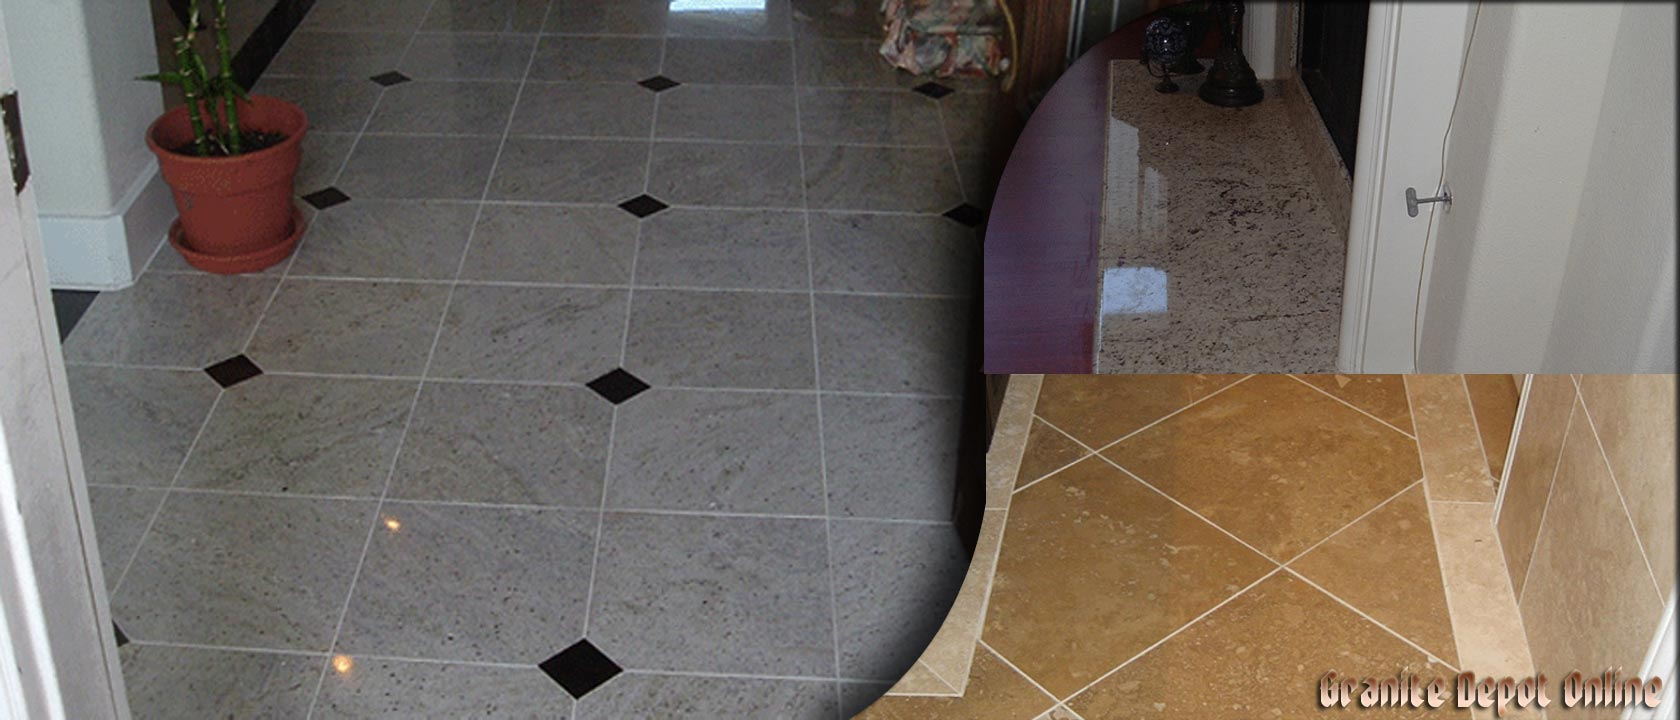 Granite Depot Online